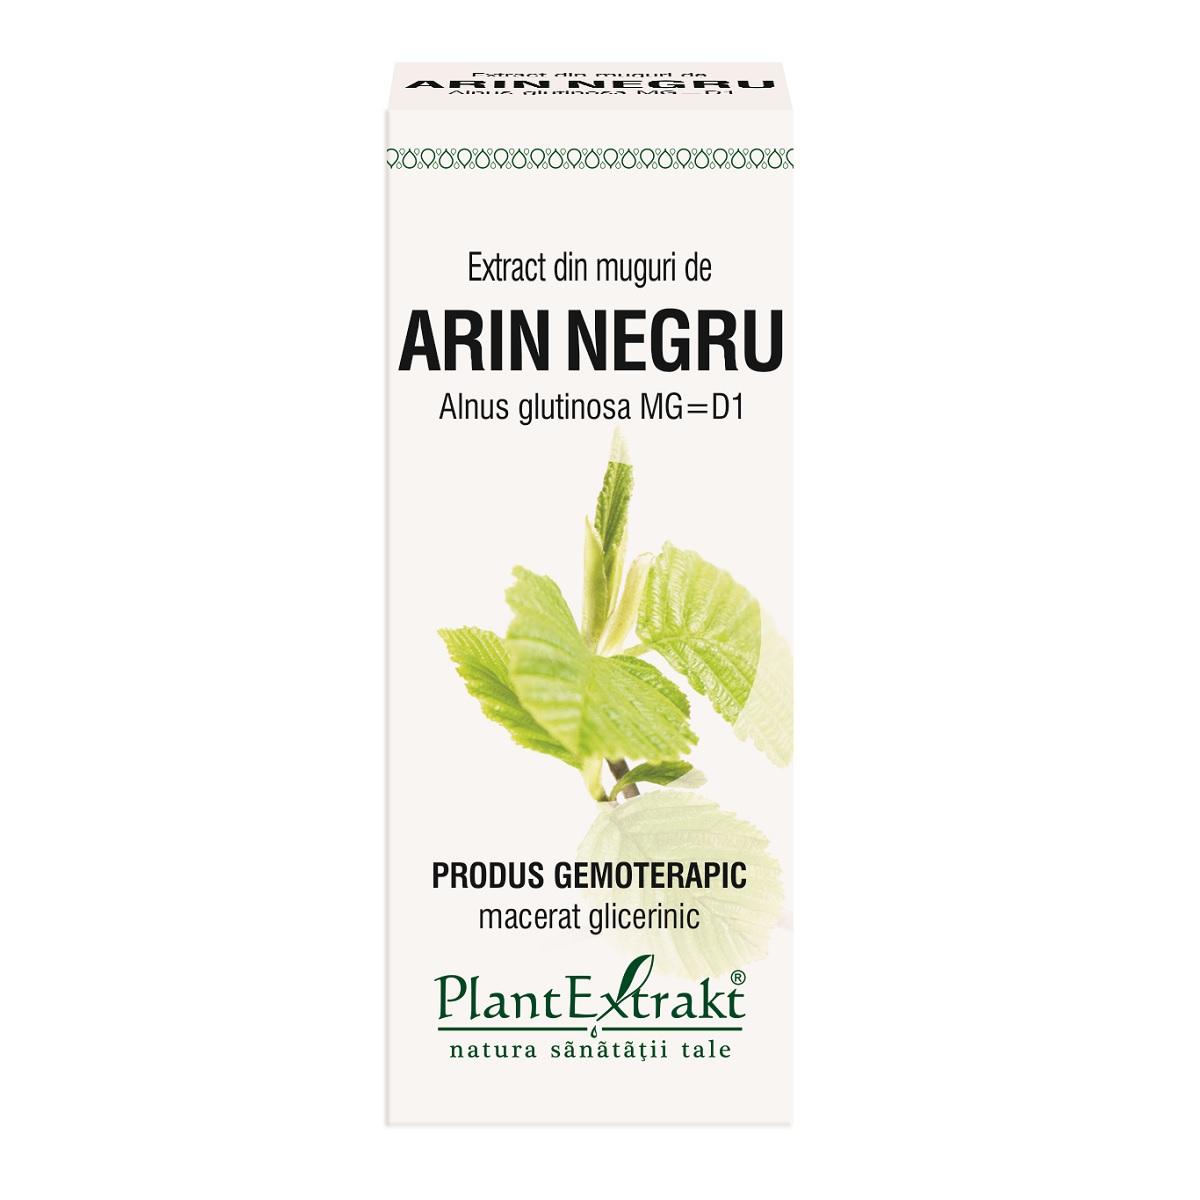 Extract din muguri de Arin Negru, 50 ml, Plant Extrakt